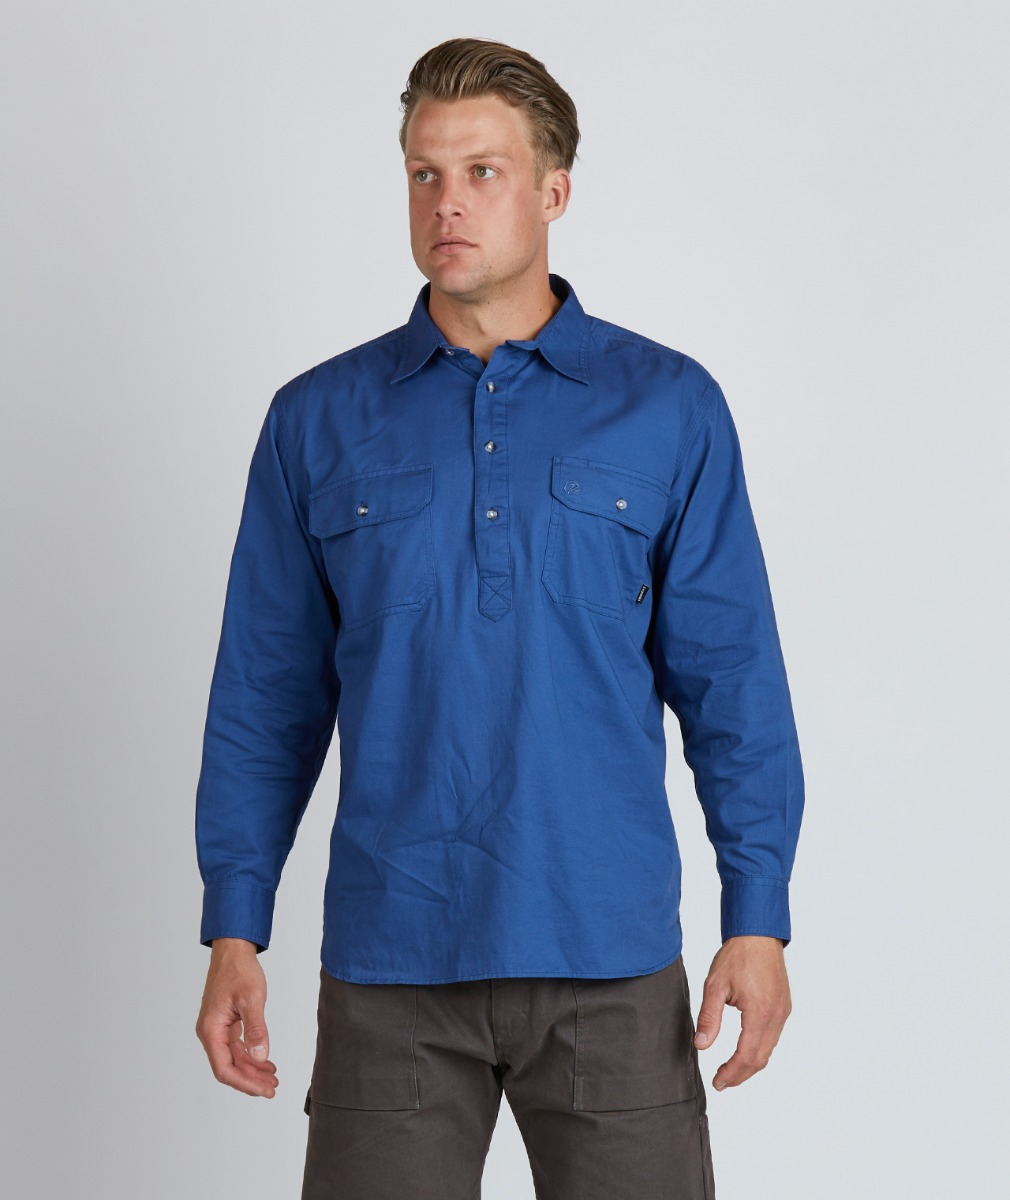 Swanndri Men's Bendigo Long Sleeve 100% Cotton Work Shirt